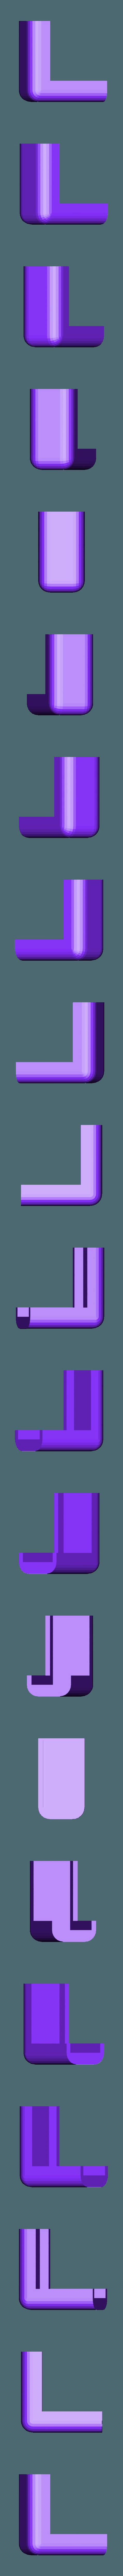 furniture-bumper.stl Download free STL file Furniture Guard Bumper • 3D printer design, jolang